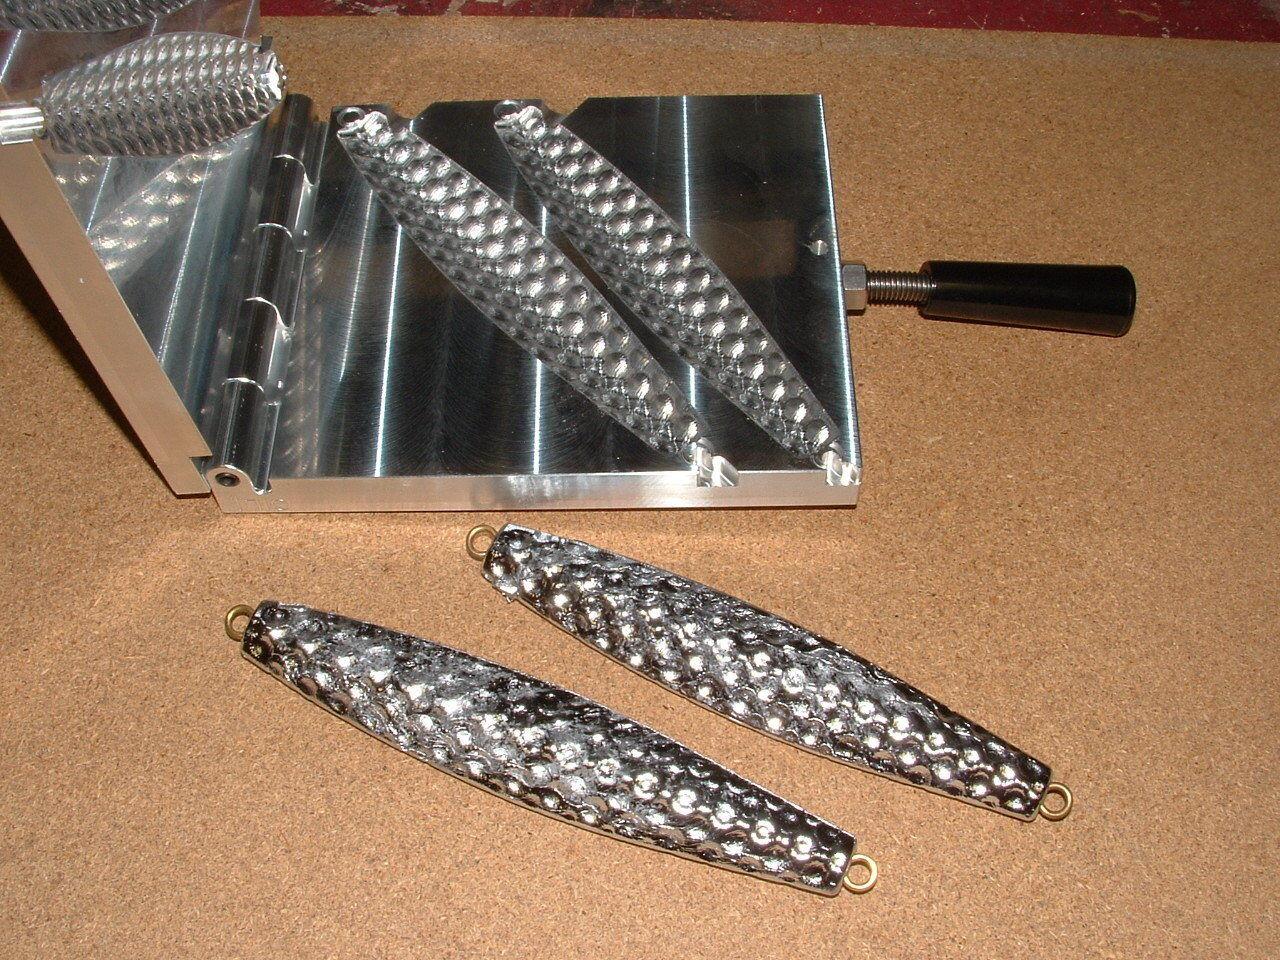 Saltwater D Jig-3 Bumpy Moule 14, 16 oz (environ 453.58 g) CNC Aluminium Diamond